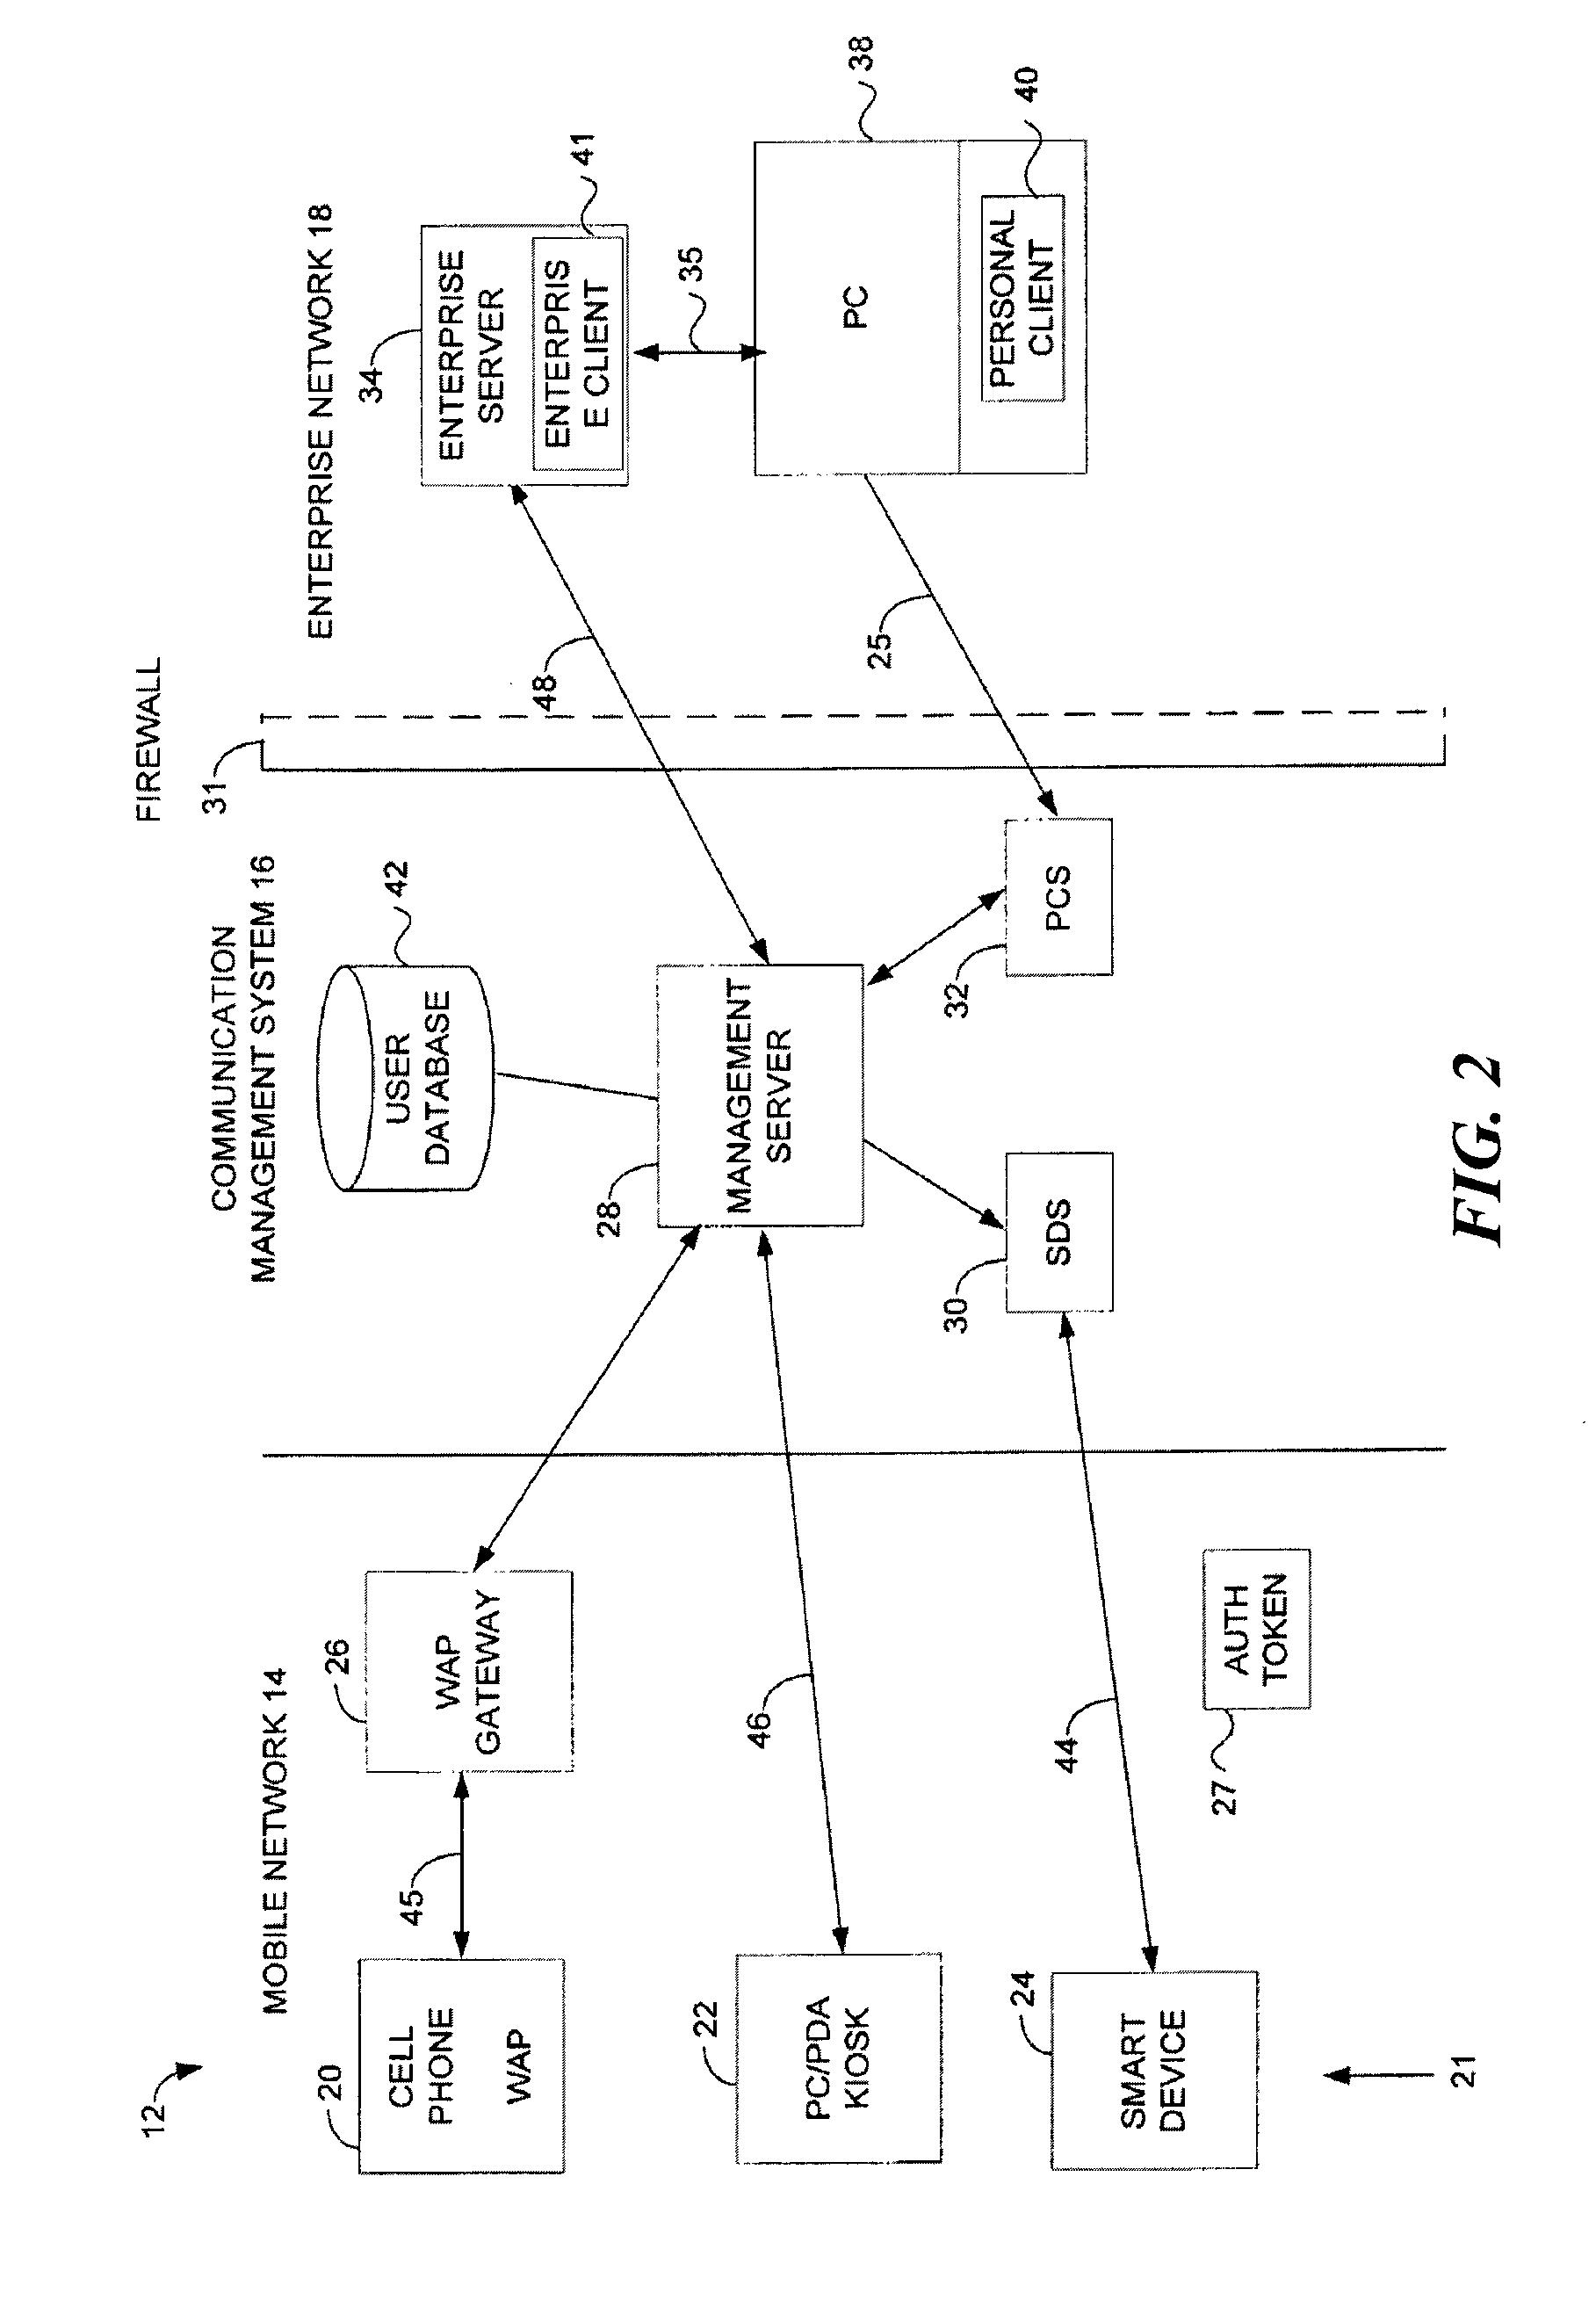 Patent US 8,811,952 B2 on